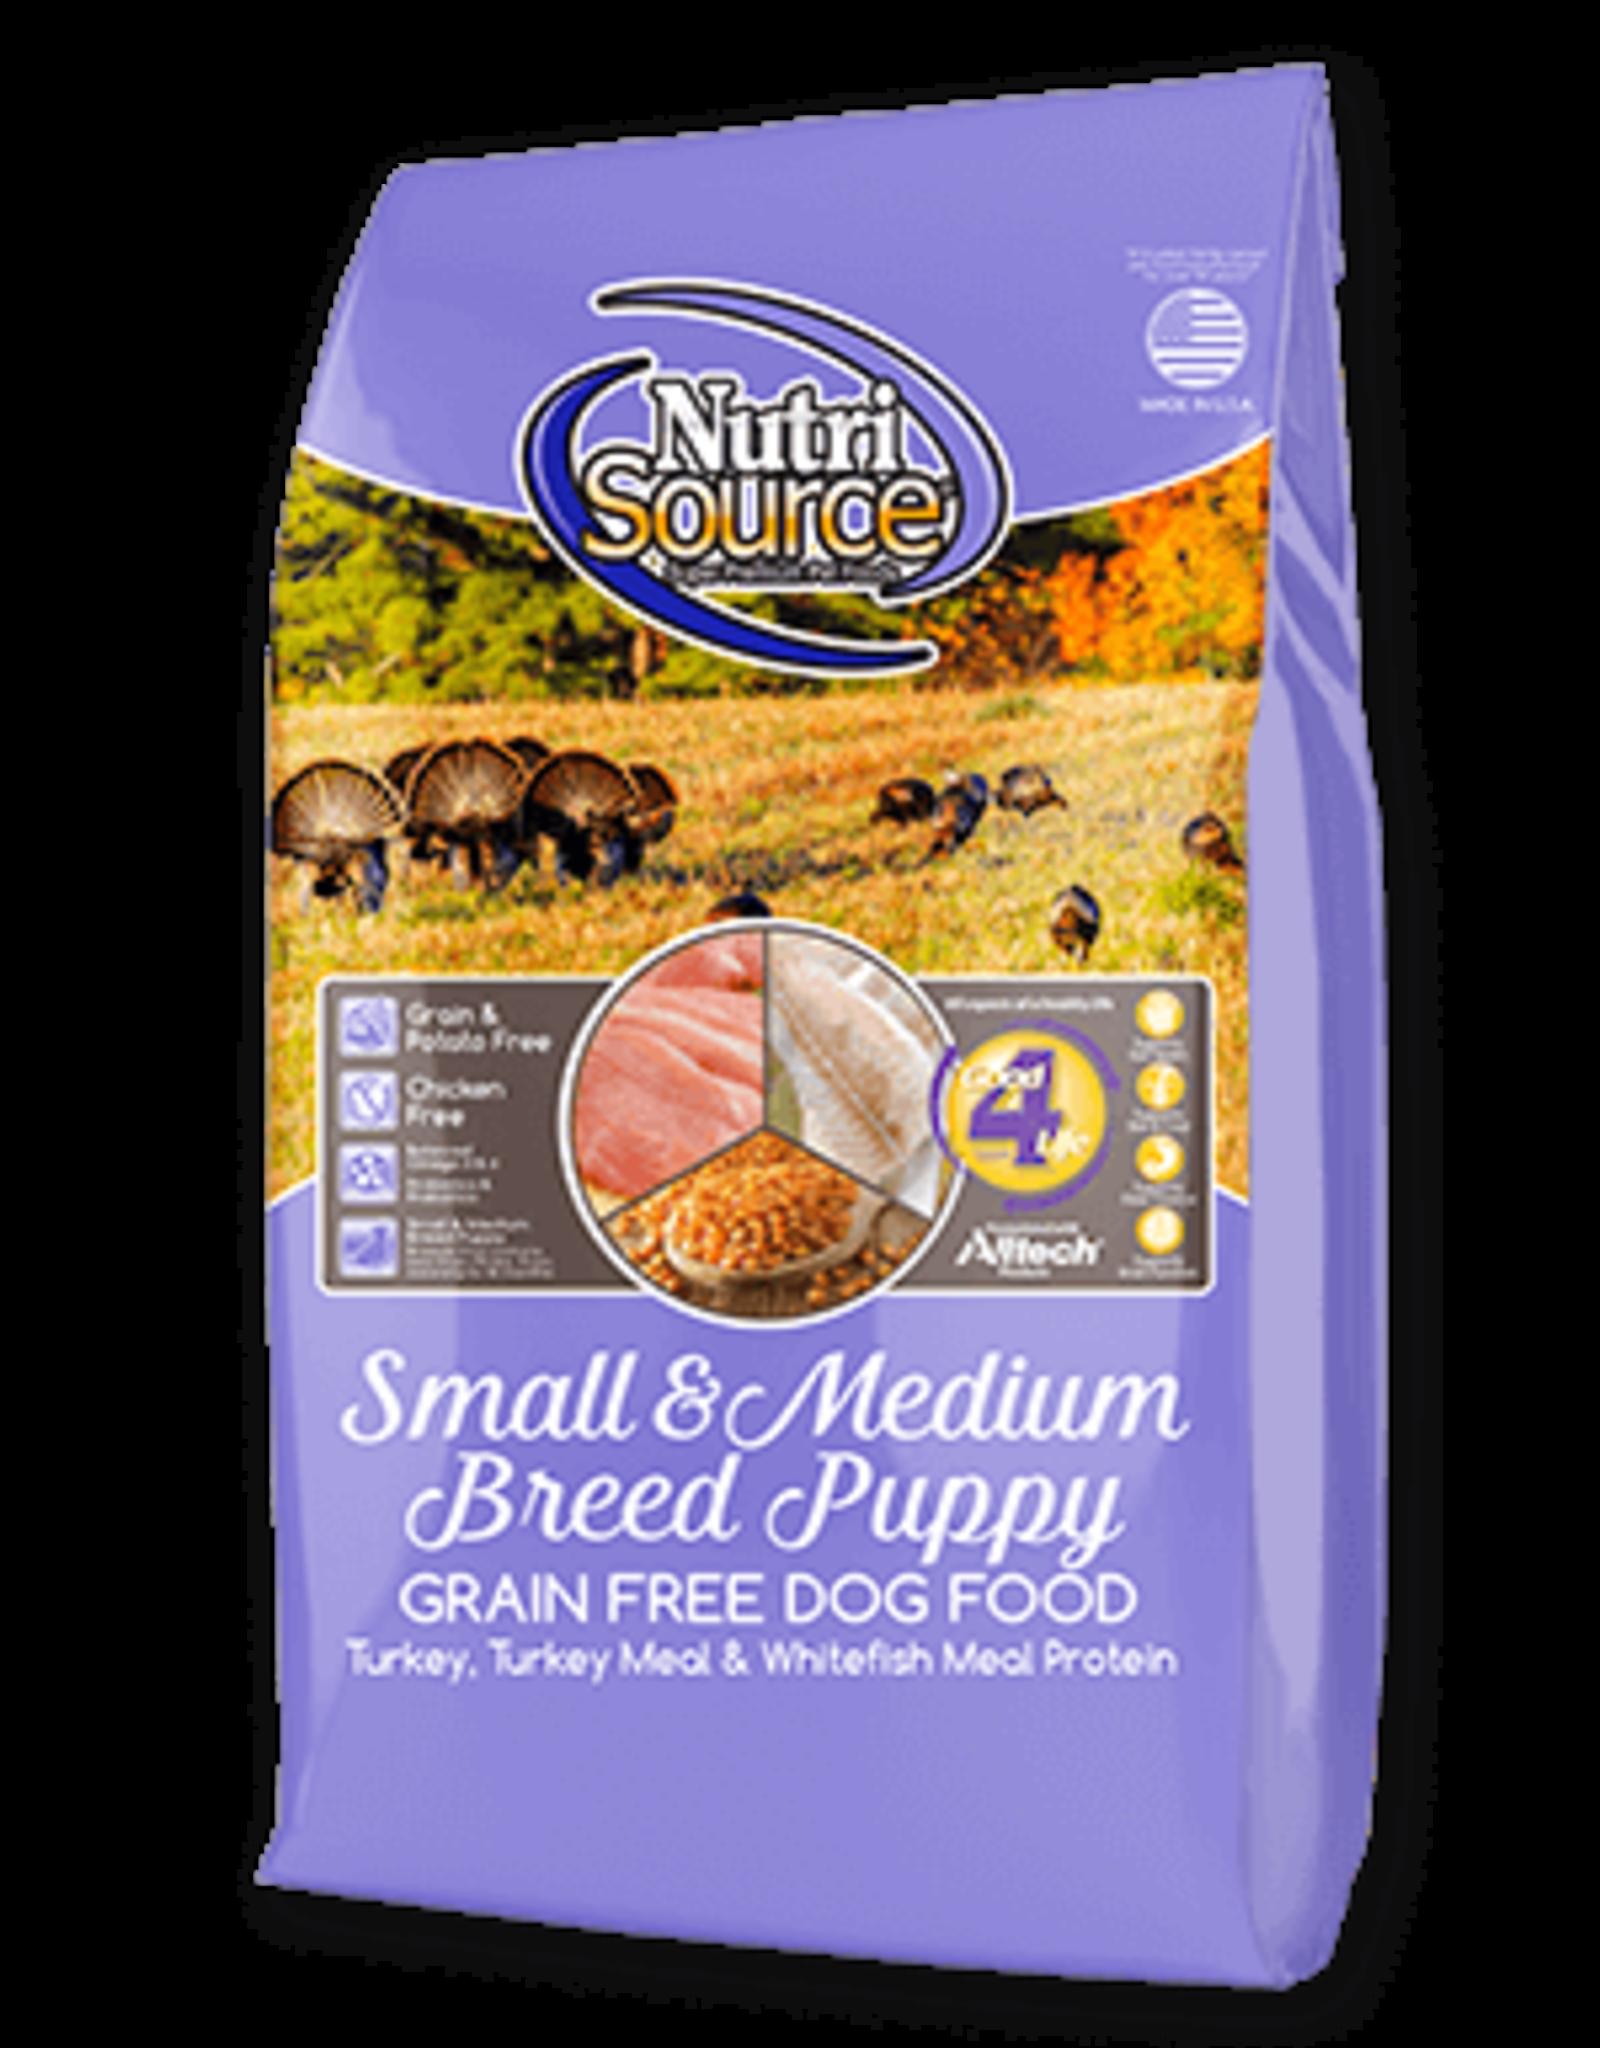 NUTRISOURCE NUTRISOURCE - GF Sm & Med Breed Puppy Turkey & Whitefish